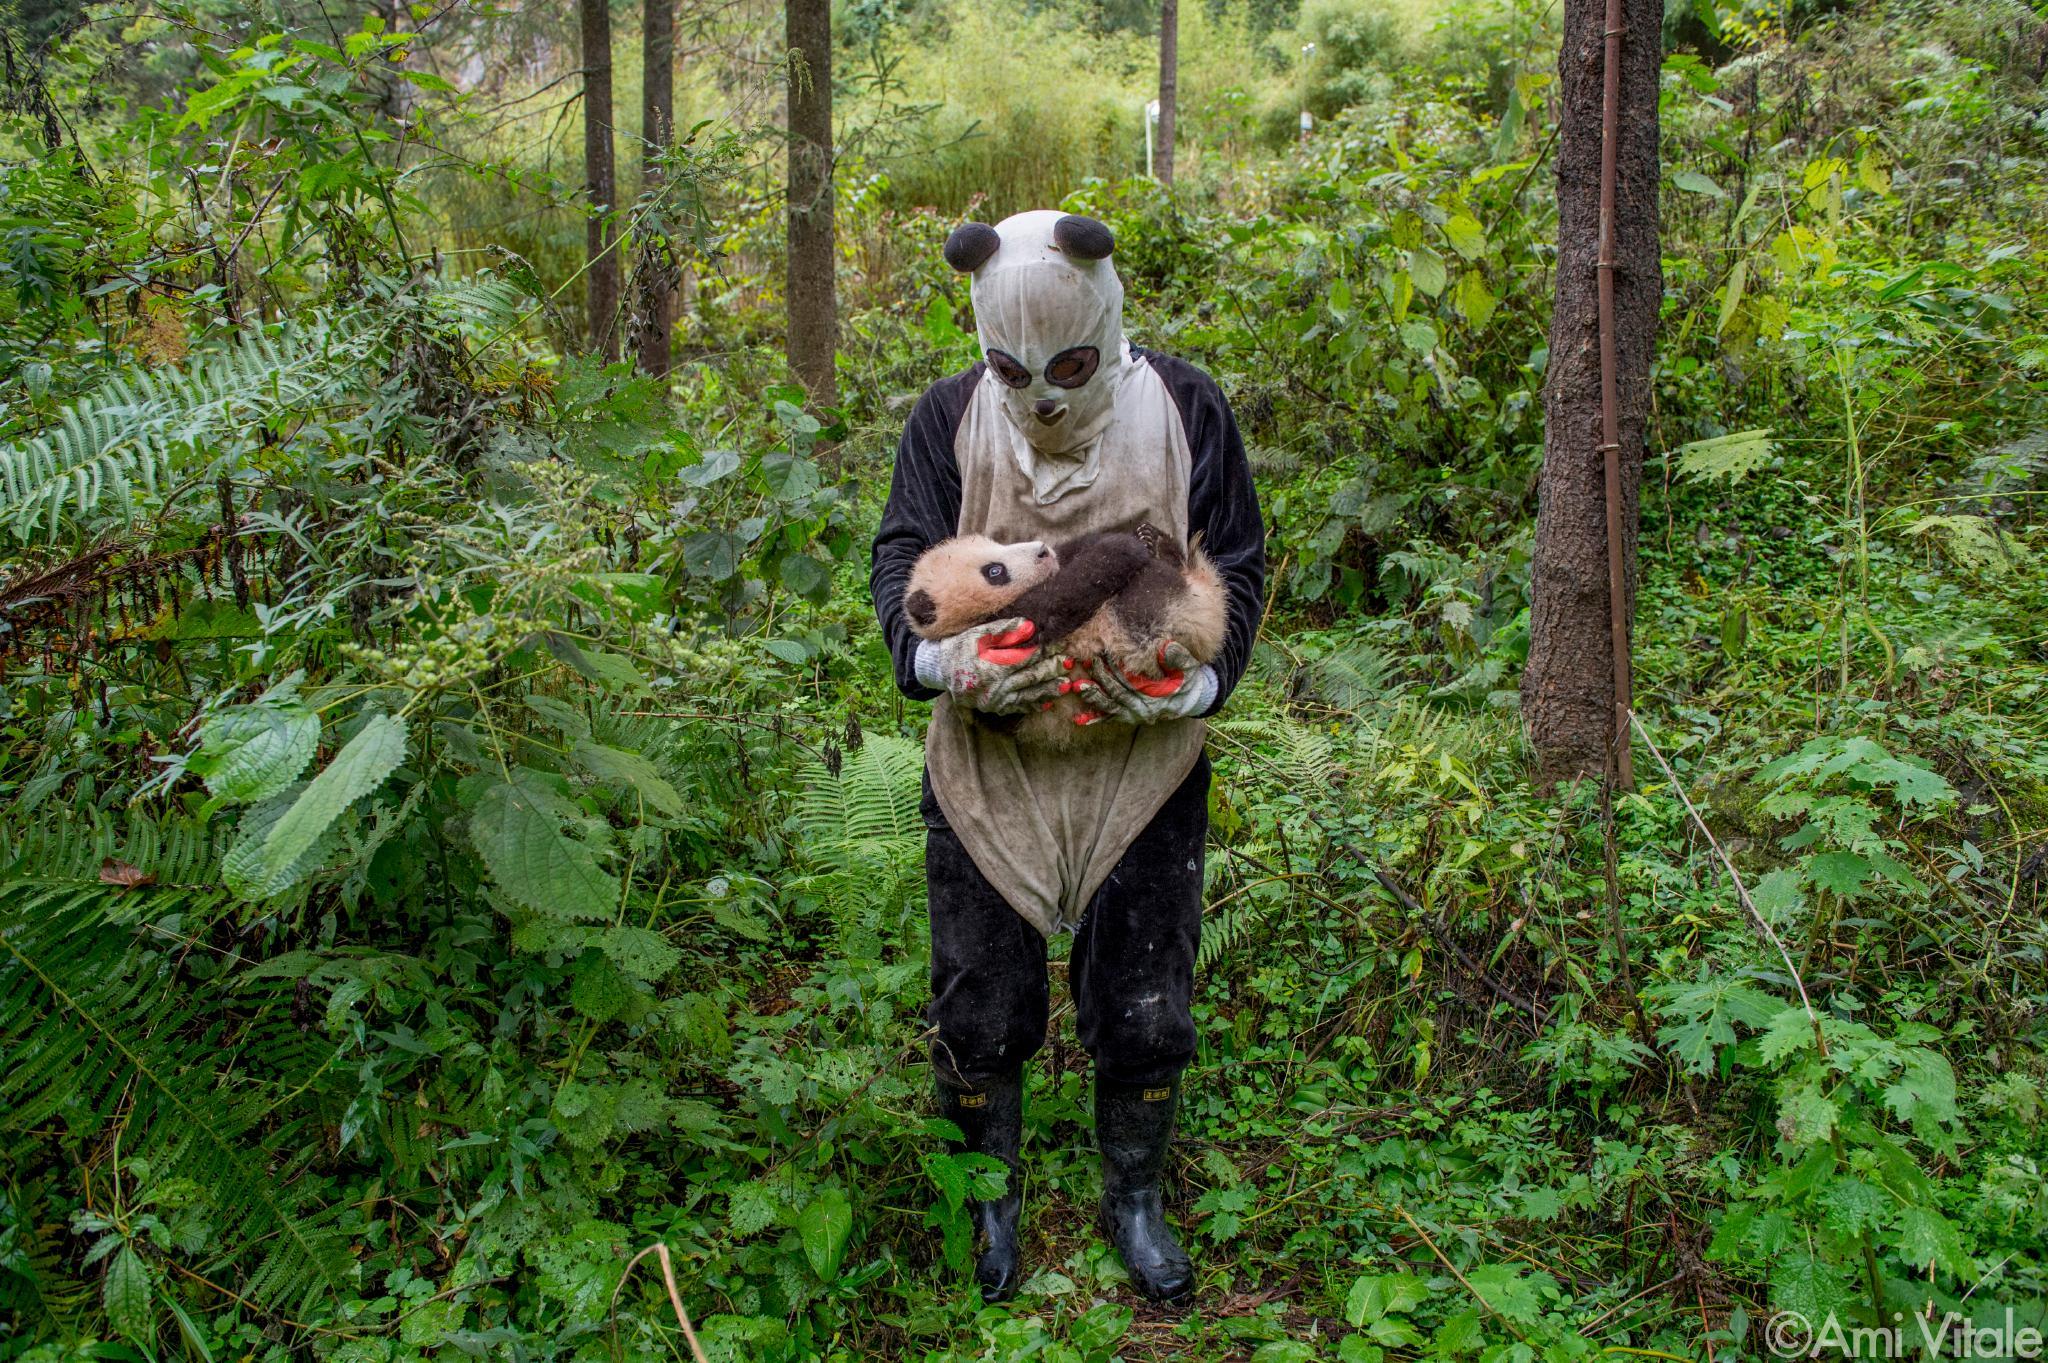 Panda love - slightly scary caretaker in panda suit looks on baby cub